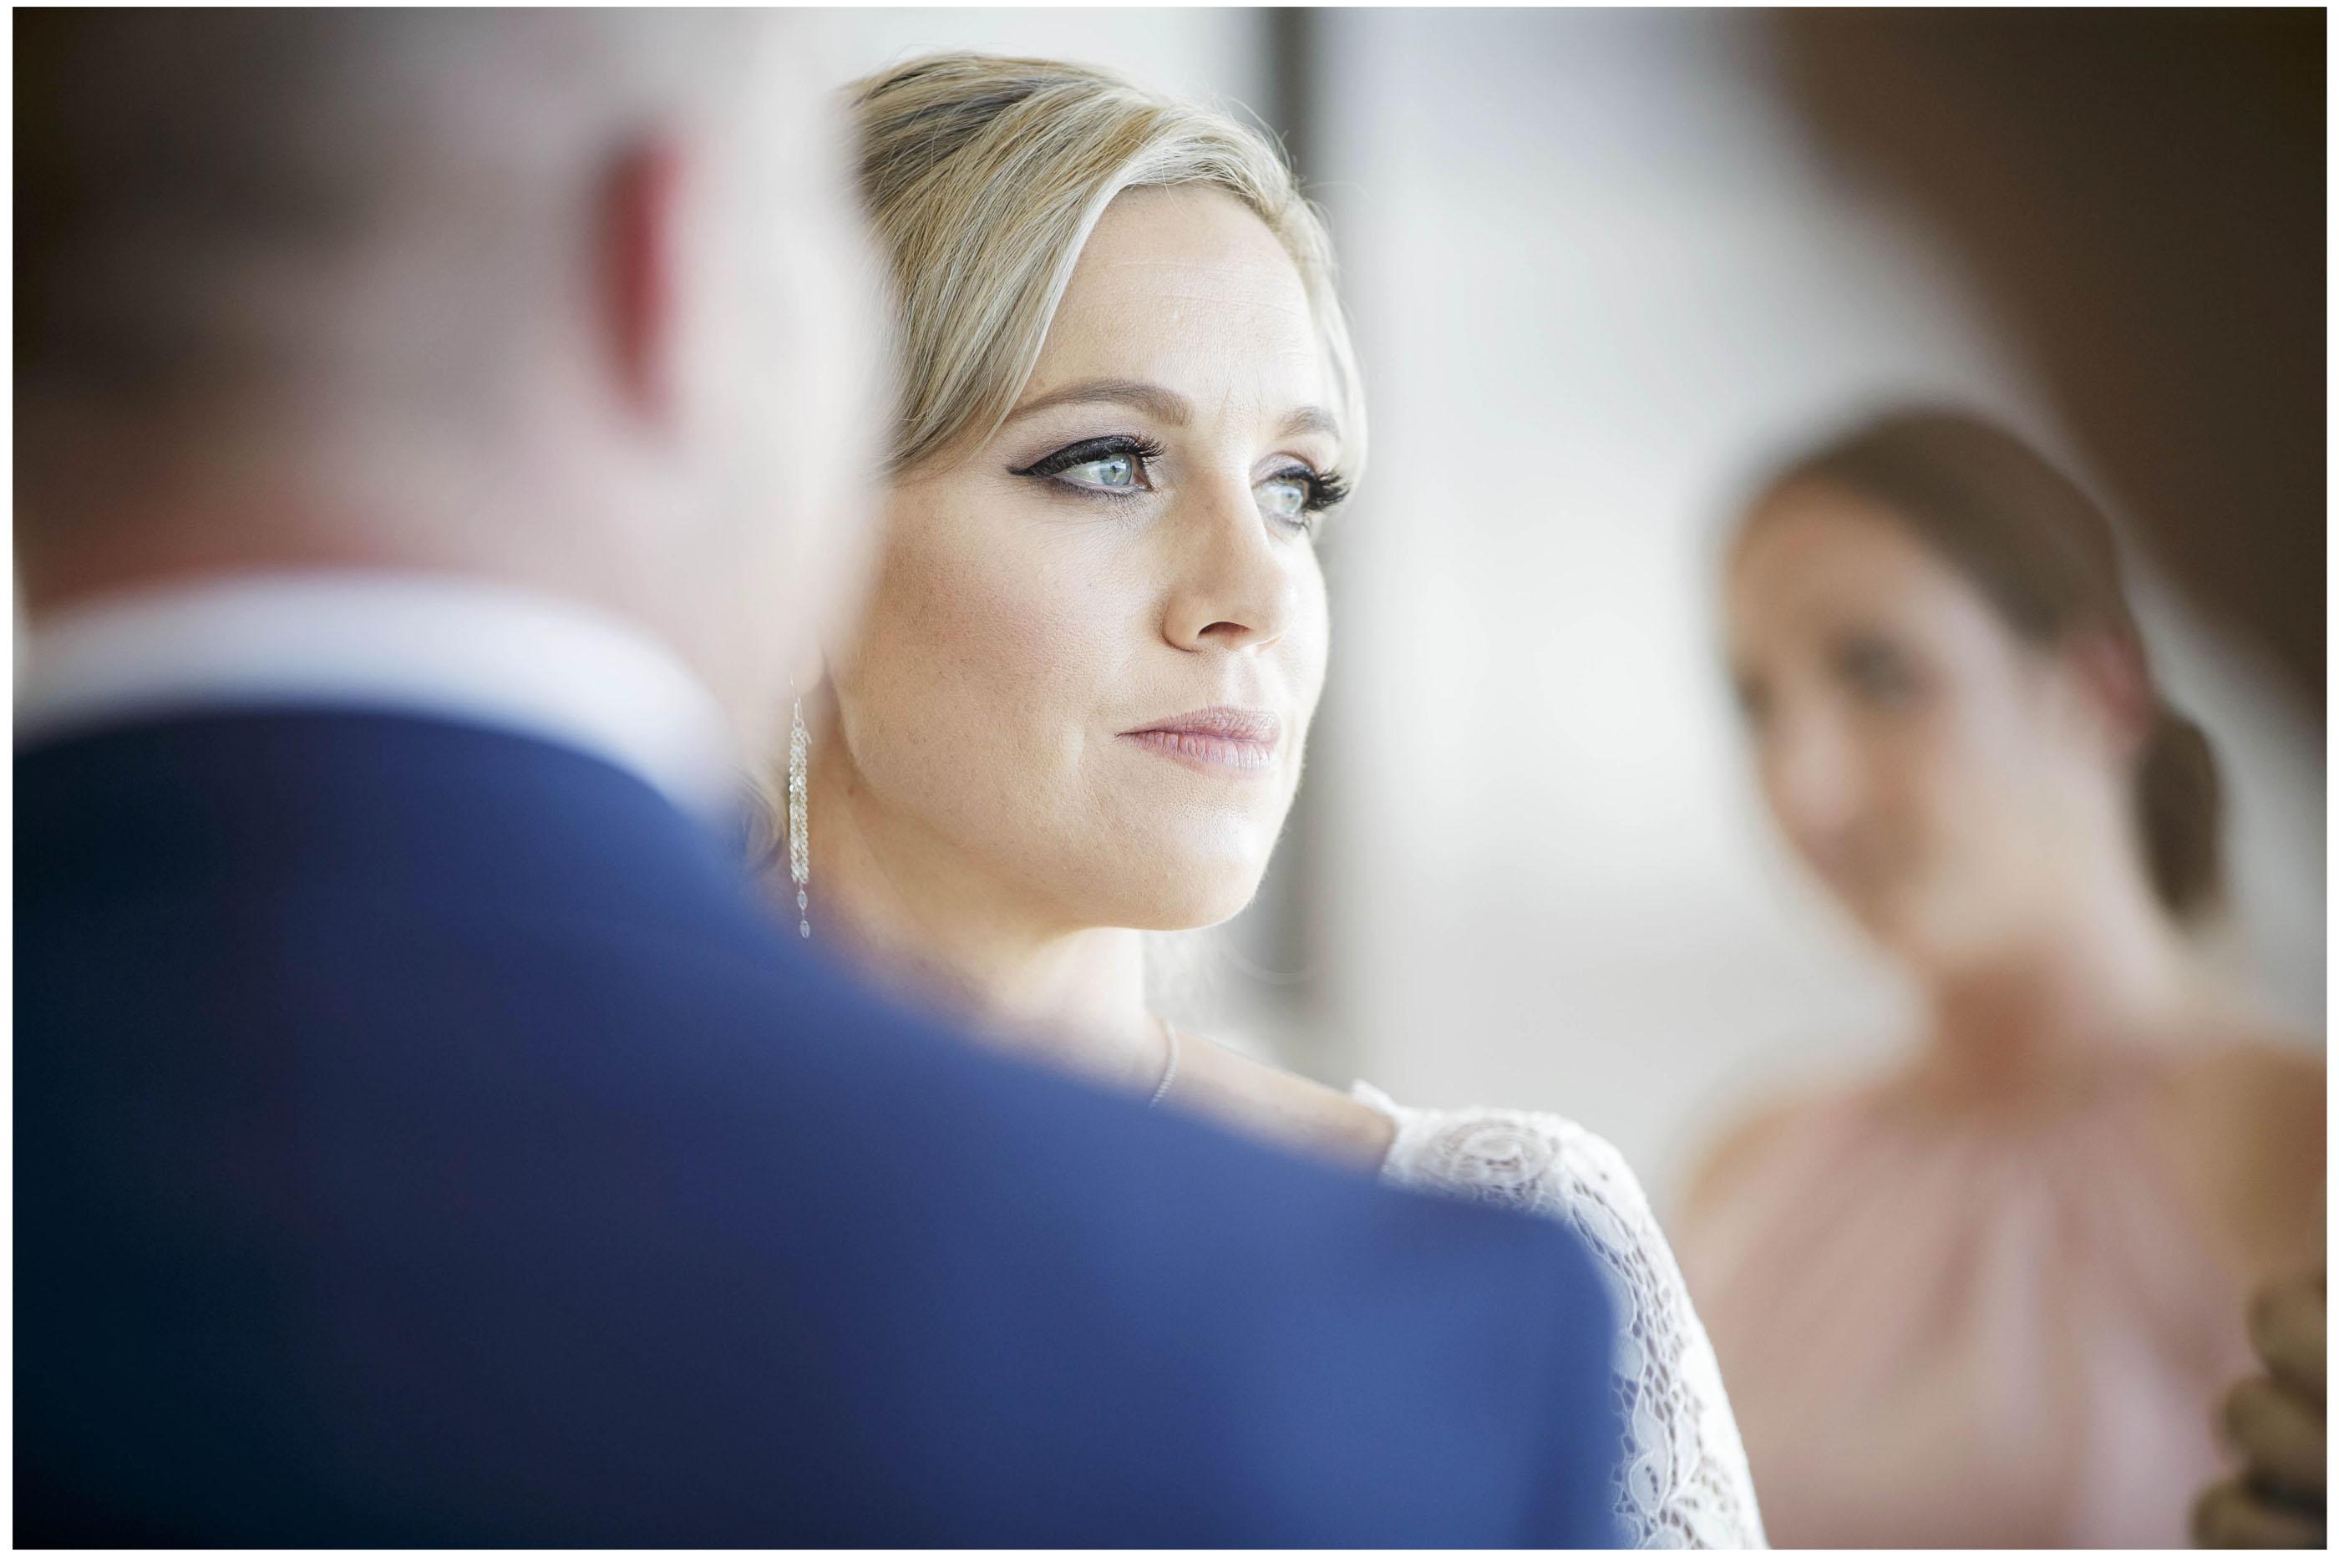 Emotional bride at wedding ceremony , Five Knotts wedding venue Auckland, Auckland wedding photographers